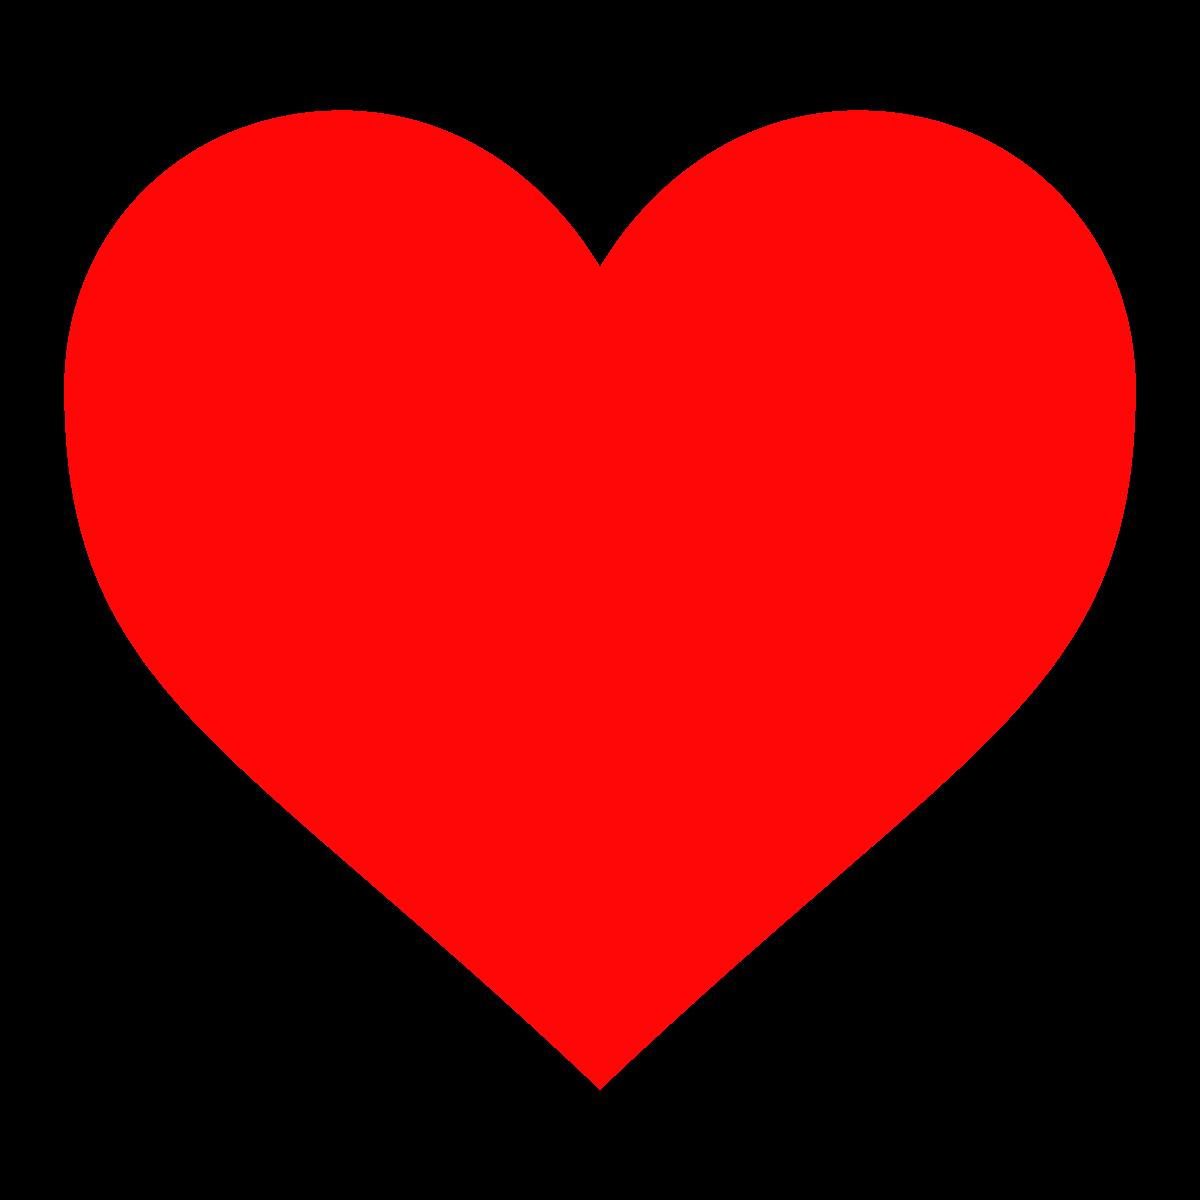 Heart-shaped clipart basic shape #3